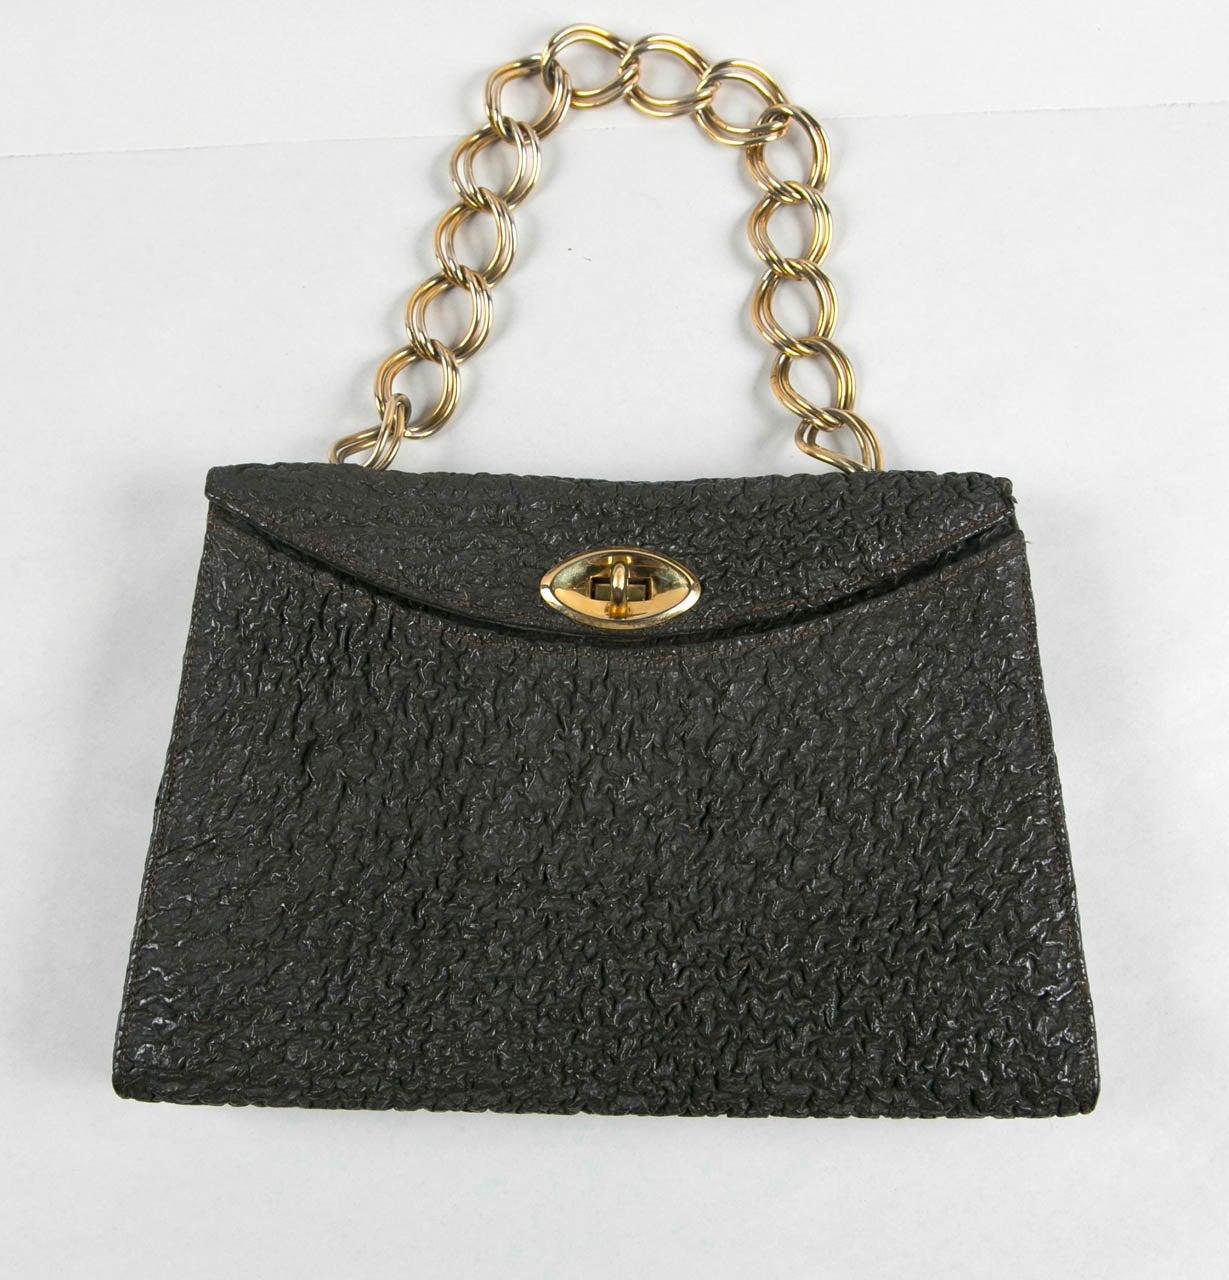 Jacomo Paris Wrinkled Leather Handbag 3